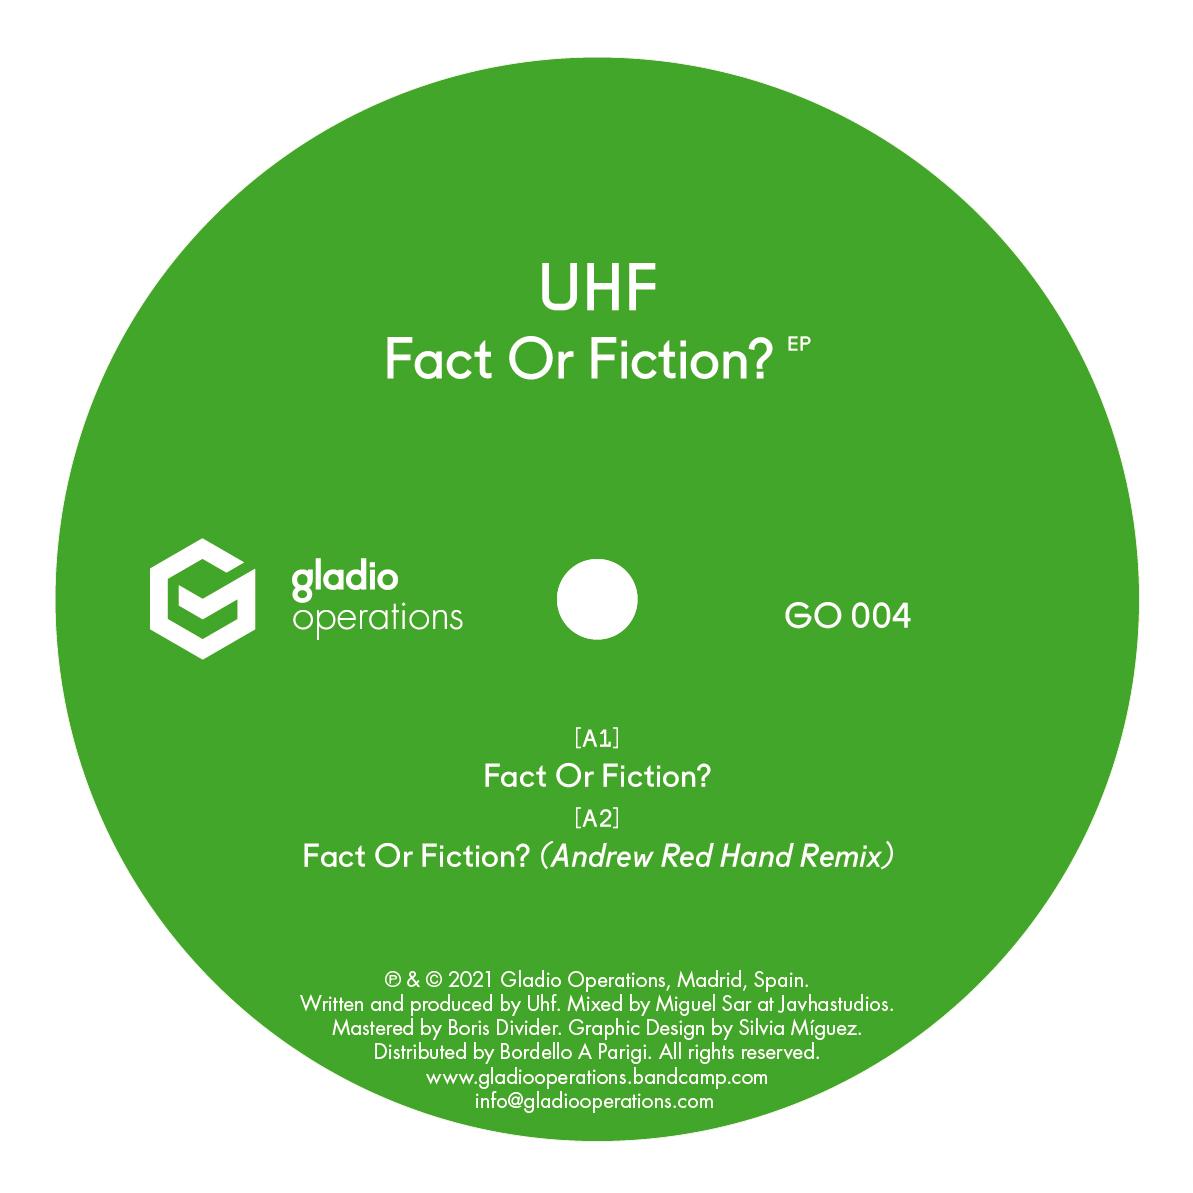 UHF - Fact Or Fiction?